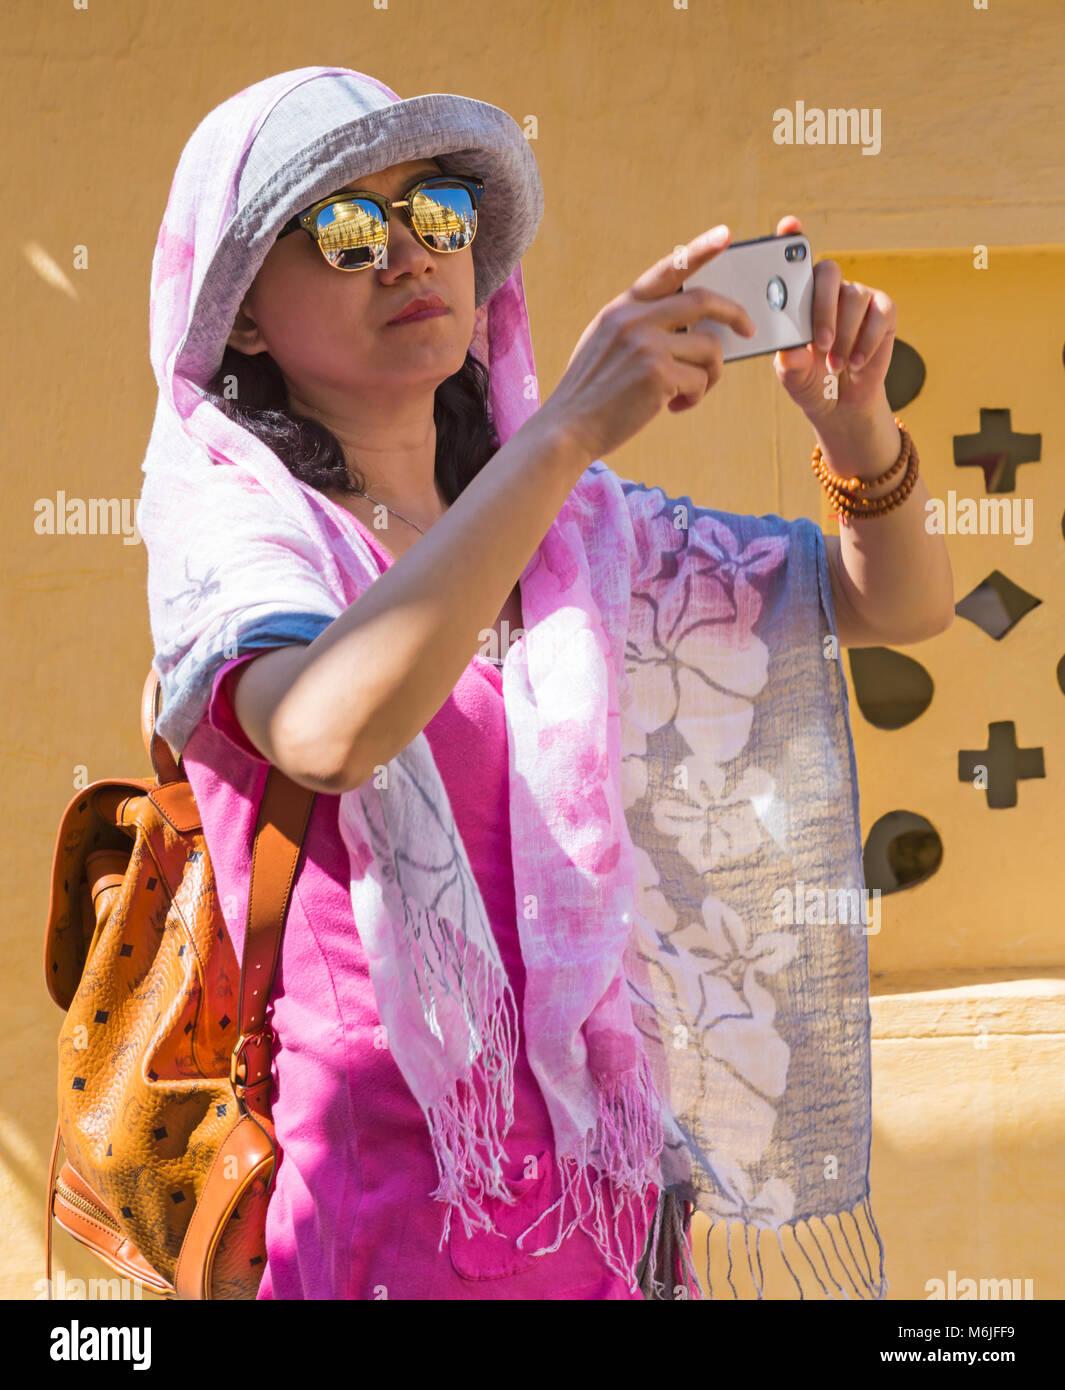 Visitor taking photos with reflections in sunglasses at Shwezigon Pagoda, Nyaung U, Bagan, Myanmar (Burma), Asia Stock Photo